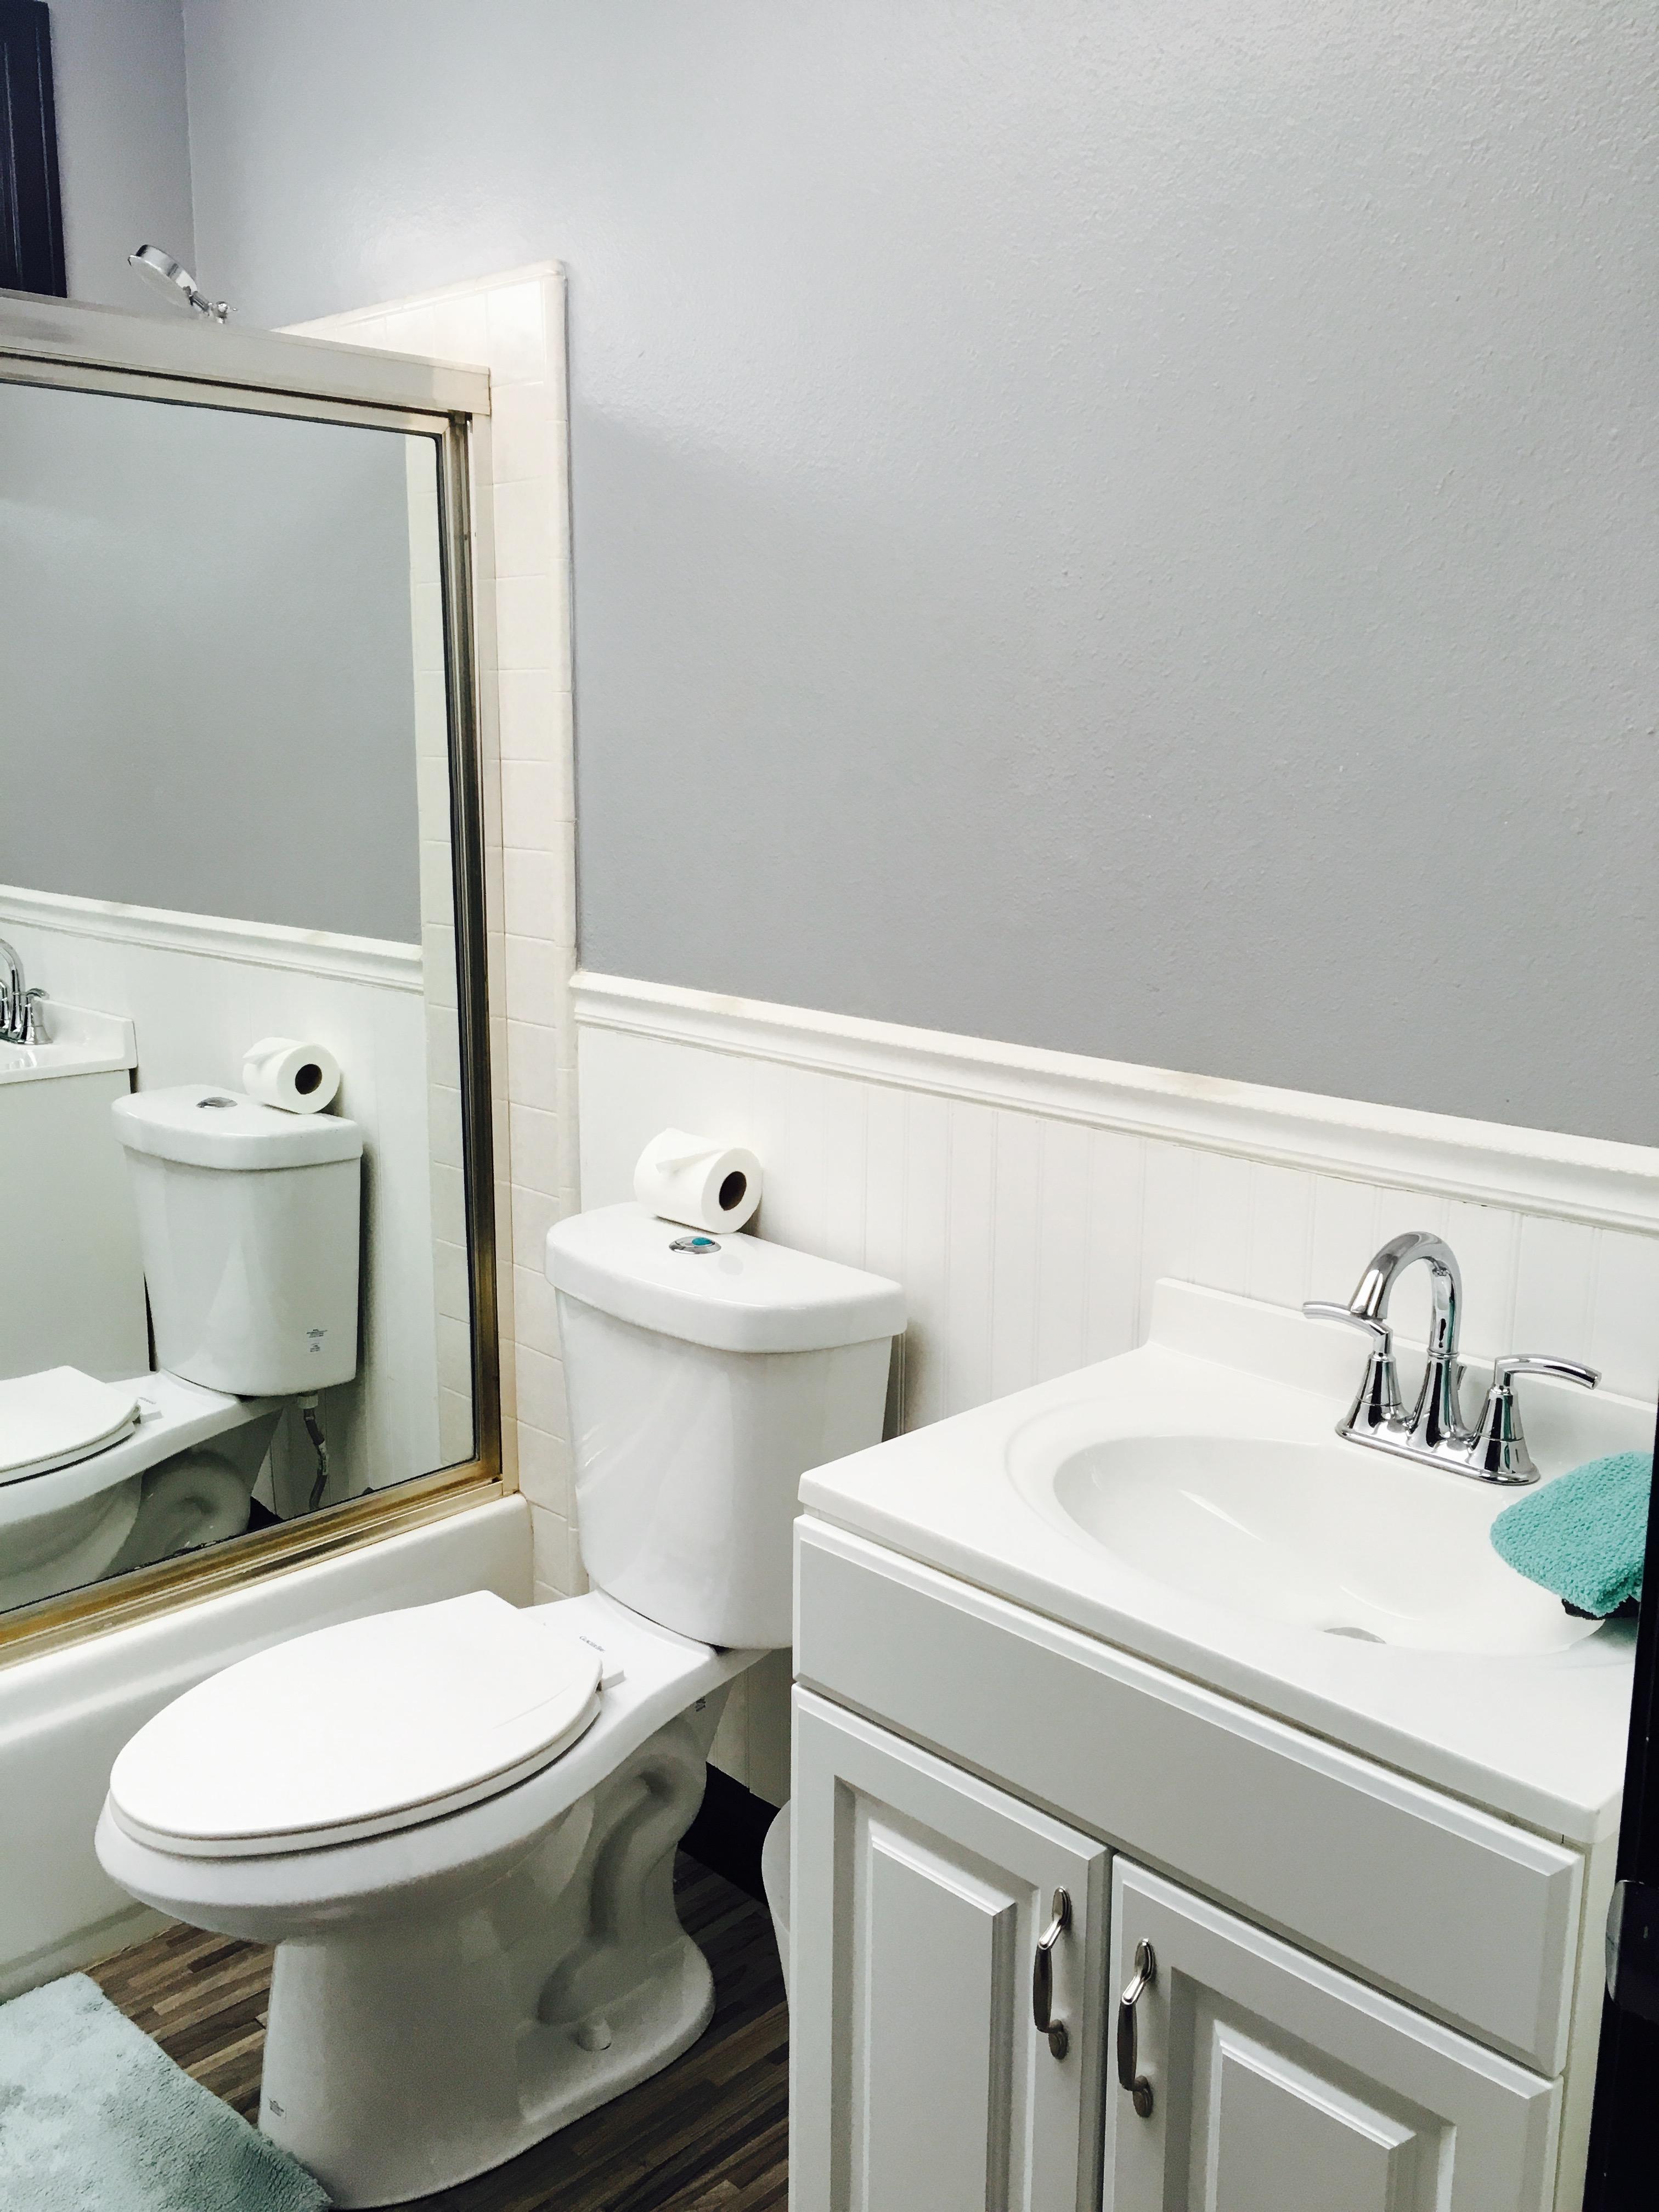 Bathroom Fixtures Huntington Beach 422 19th street home in huntington beach ~ ra134551   redawning